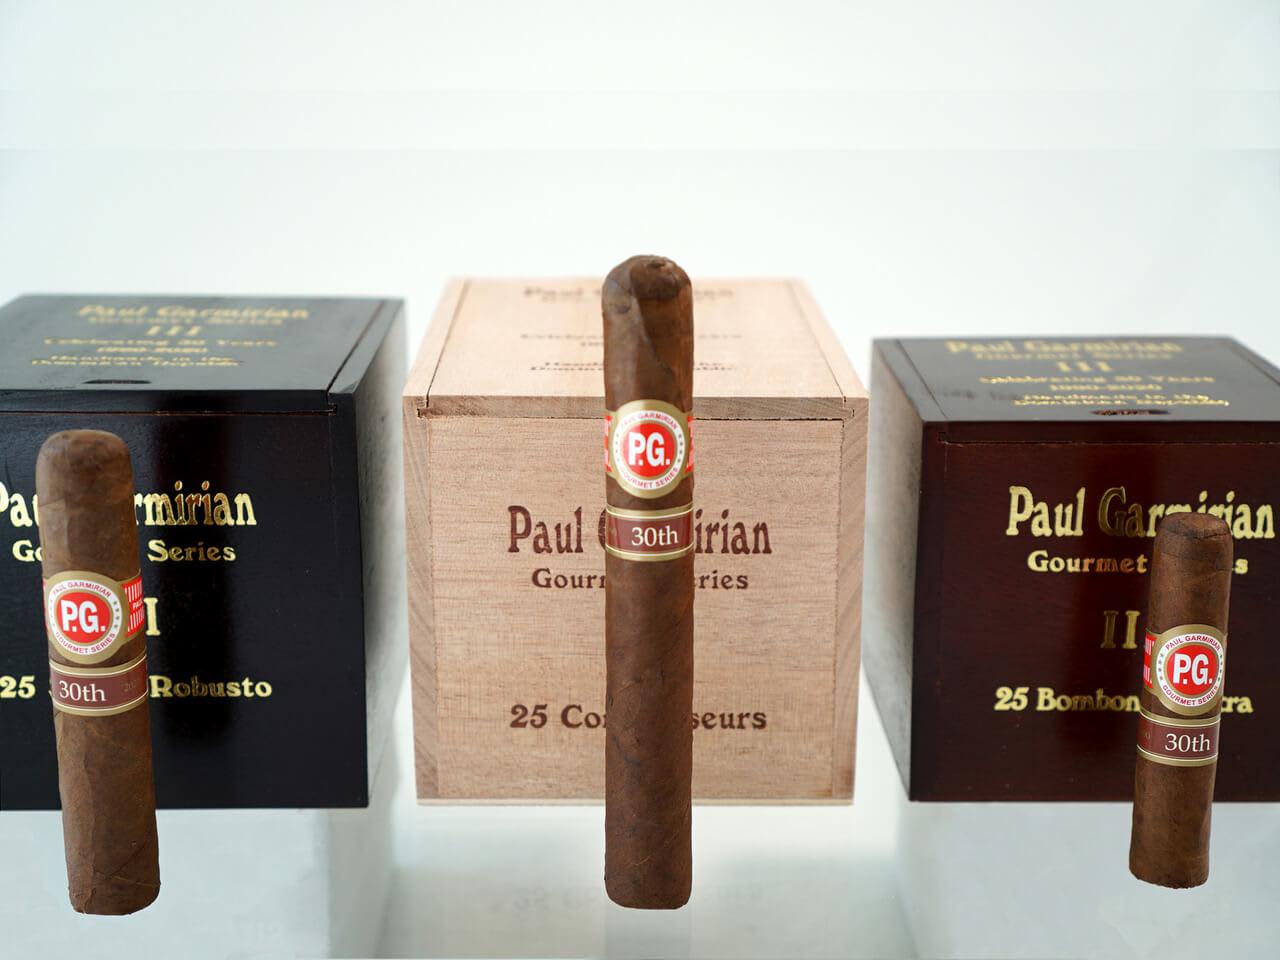 Paul Garmirian Cigars Celebrates 30th Anniversary Featured Image